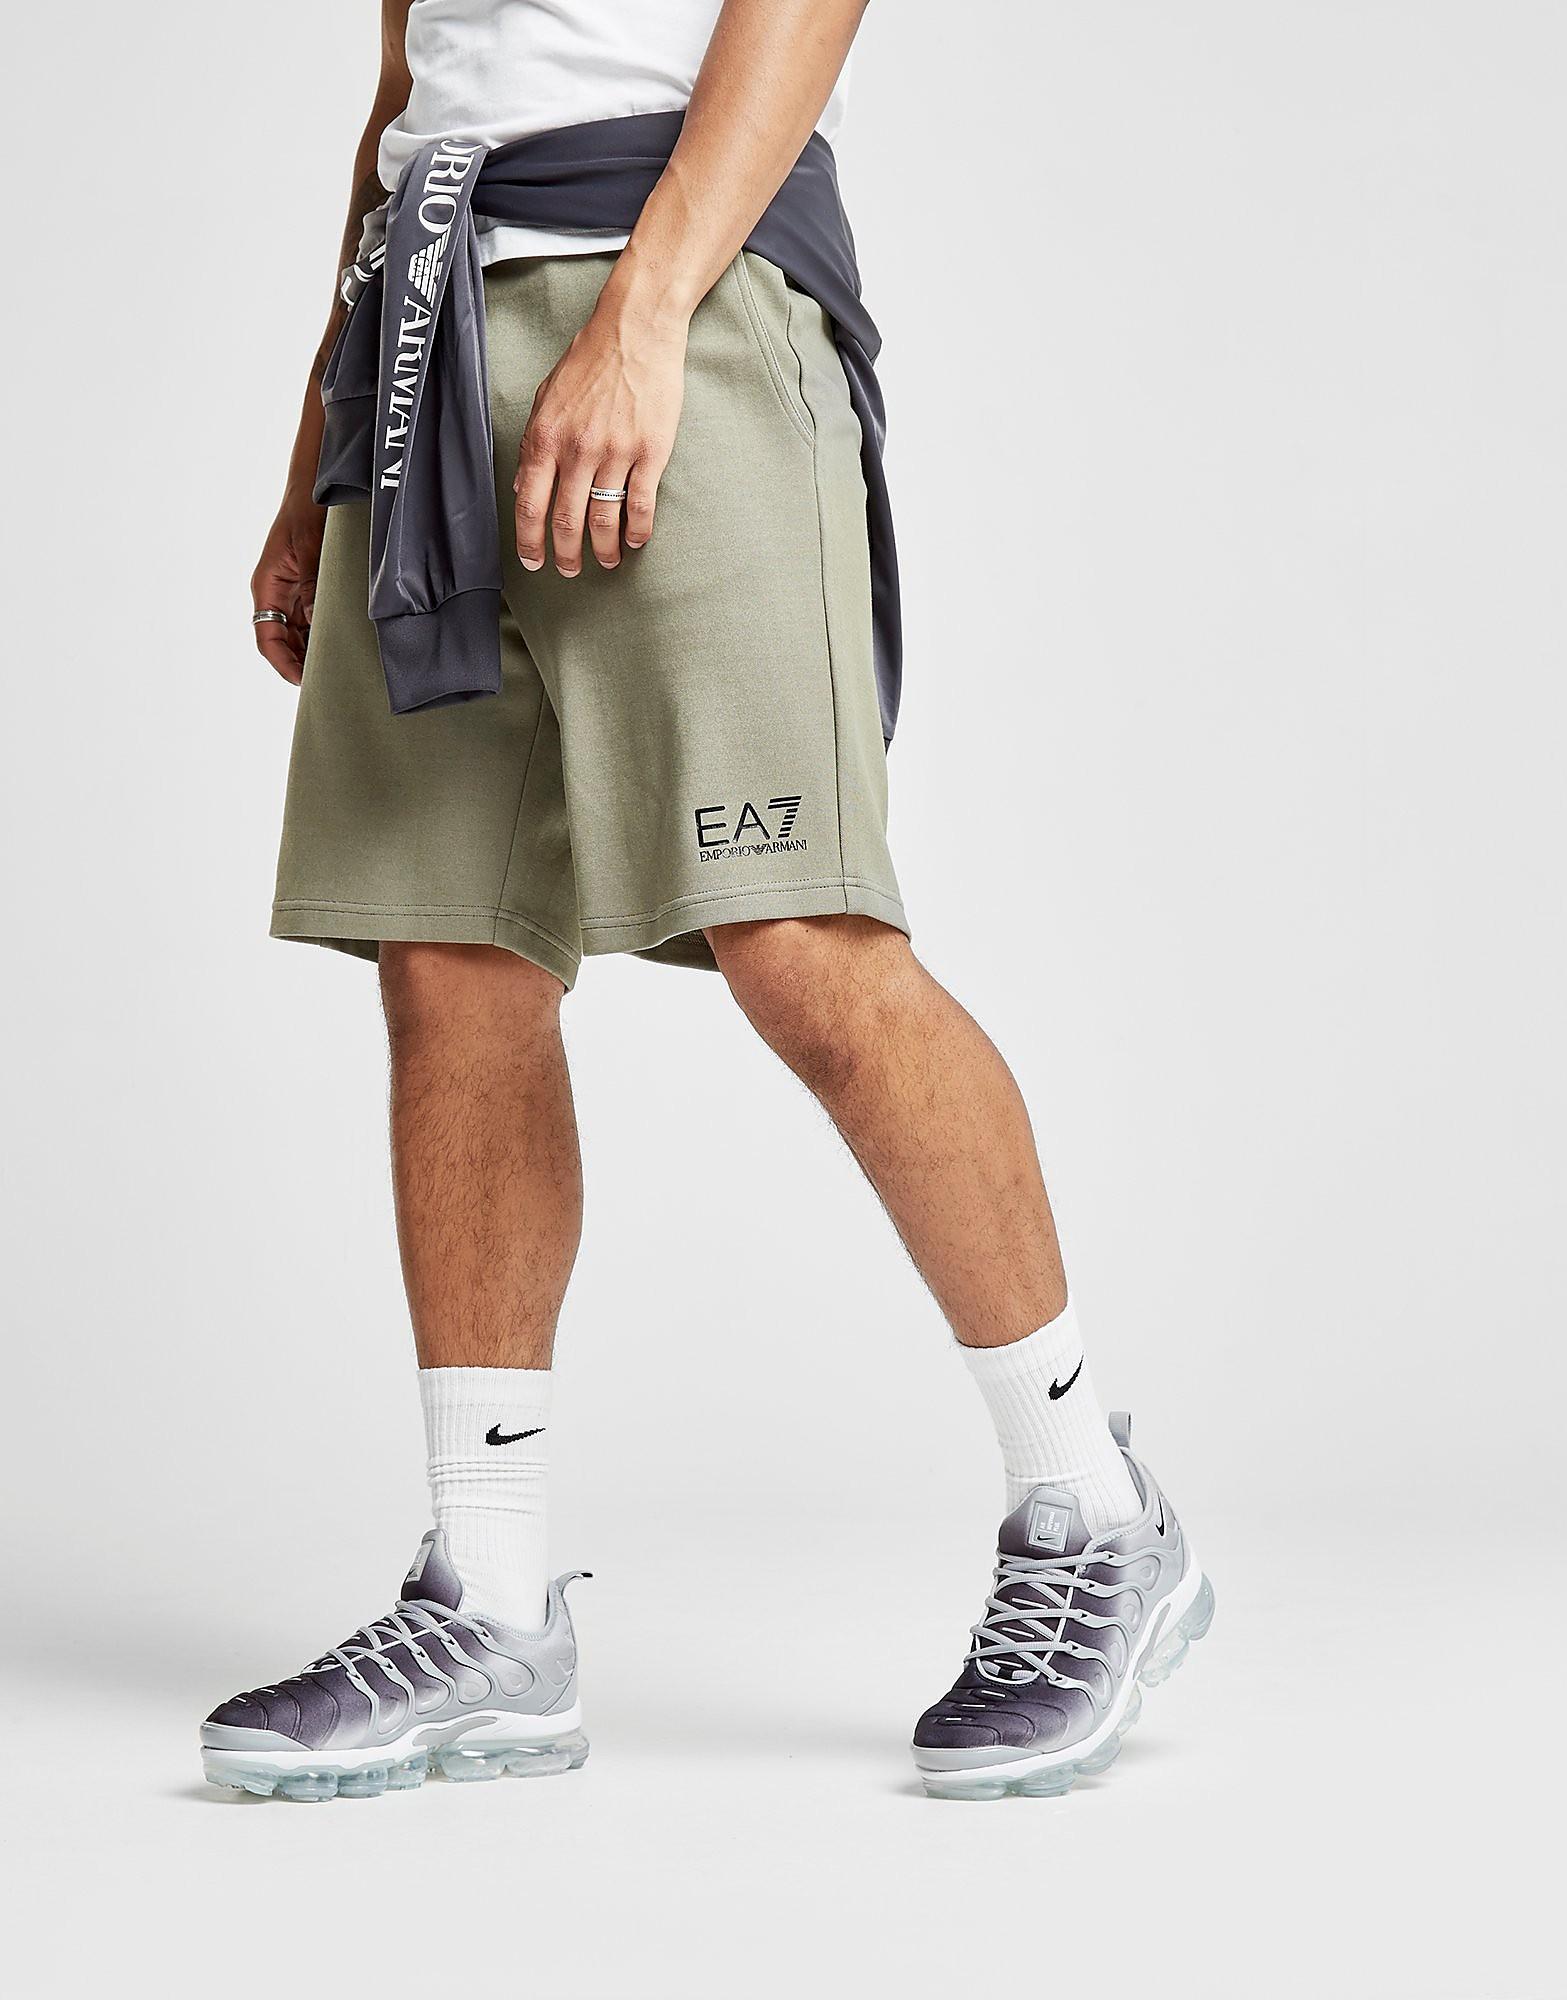 Emporio Armani EA7 Double Knit Shorts